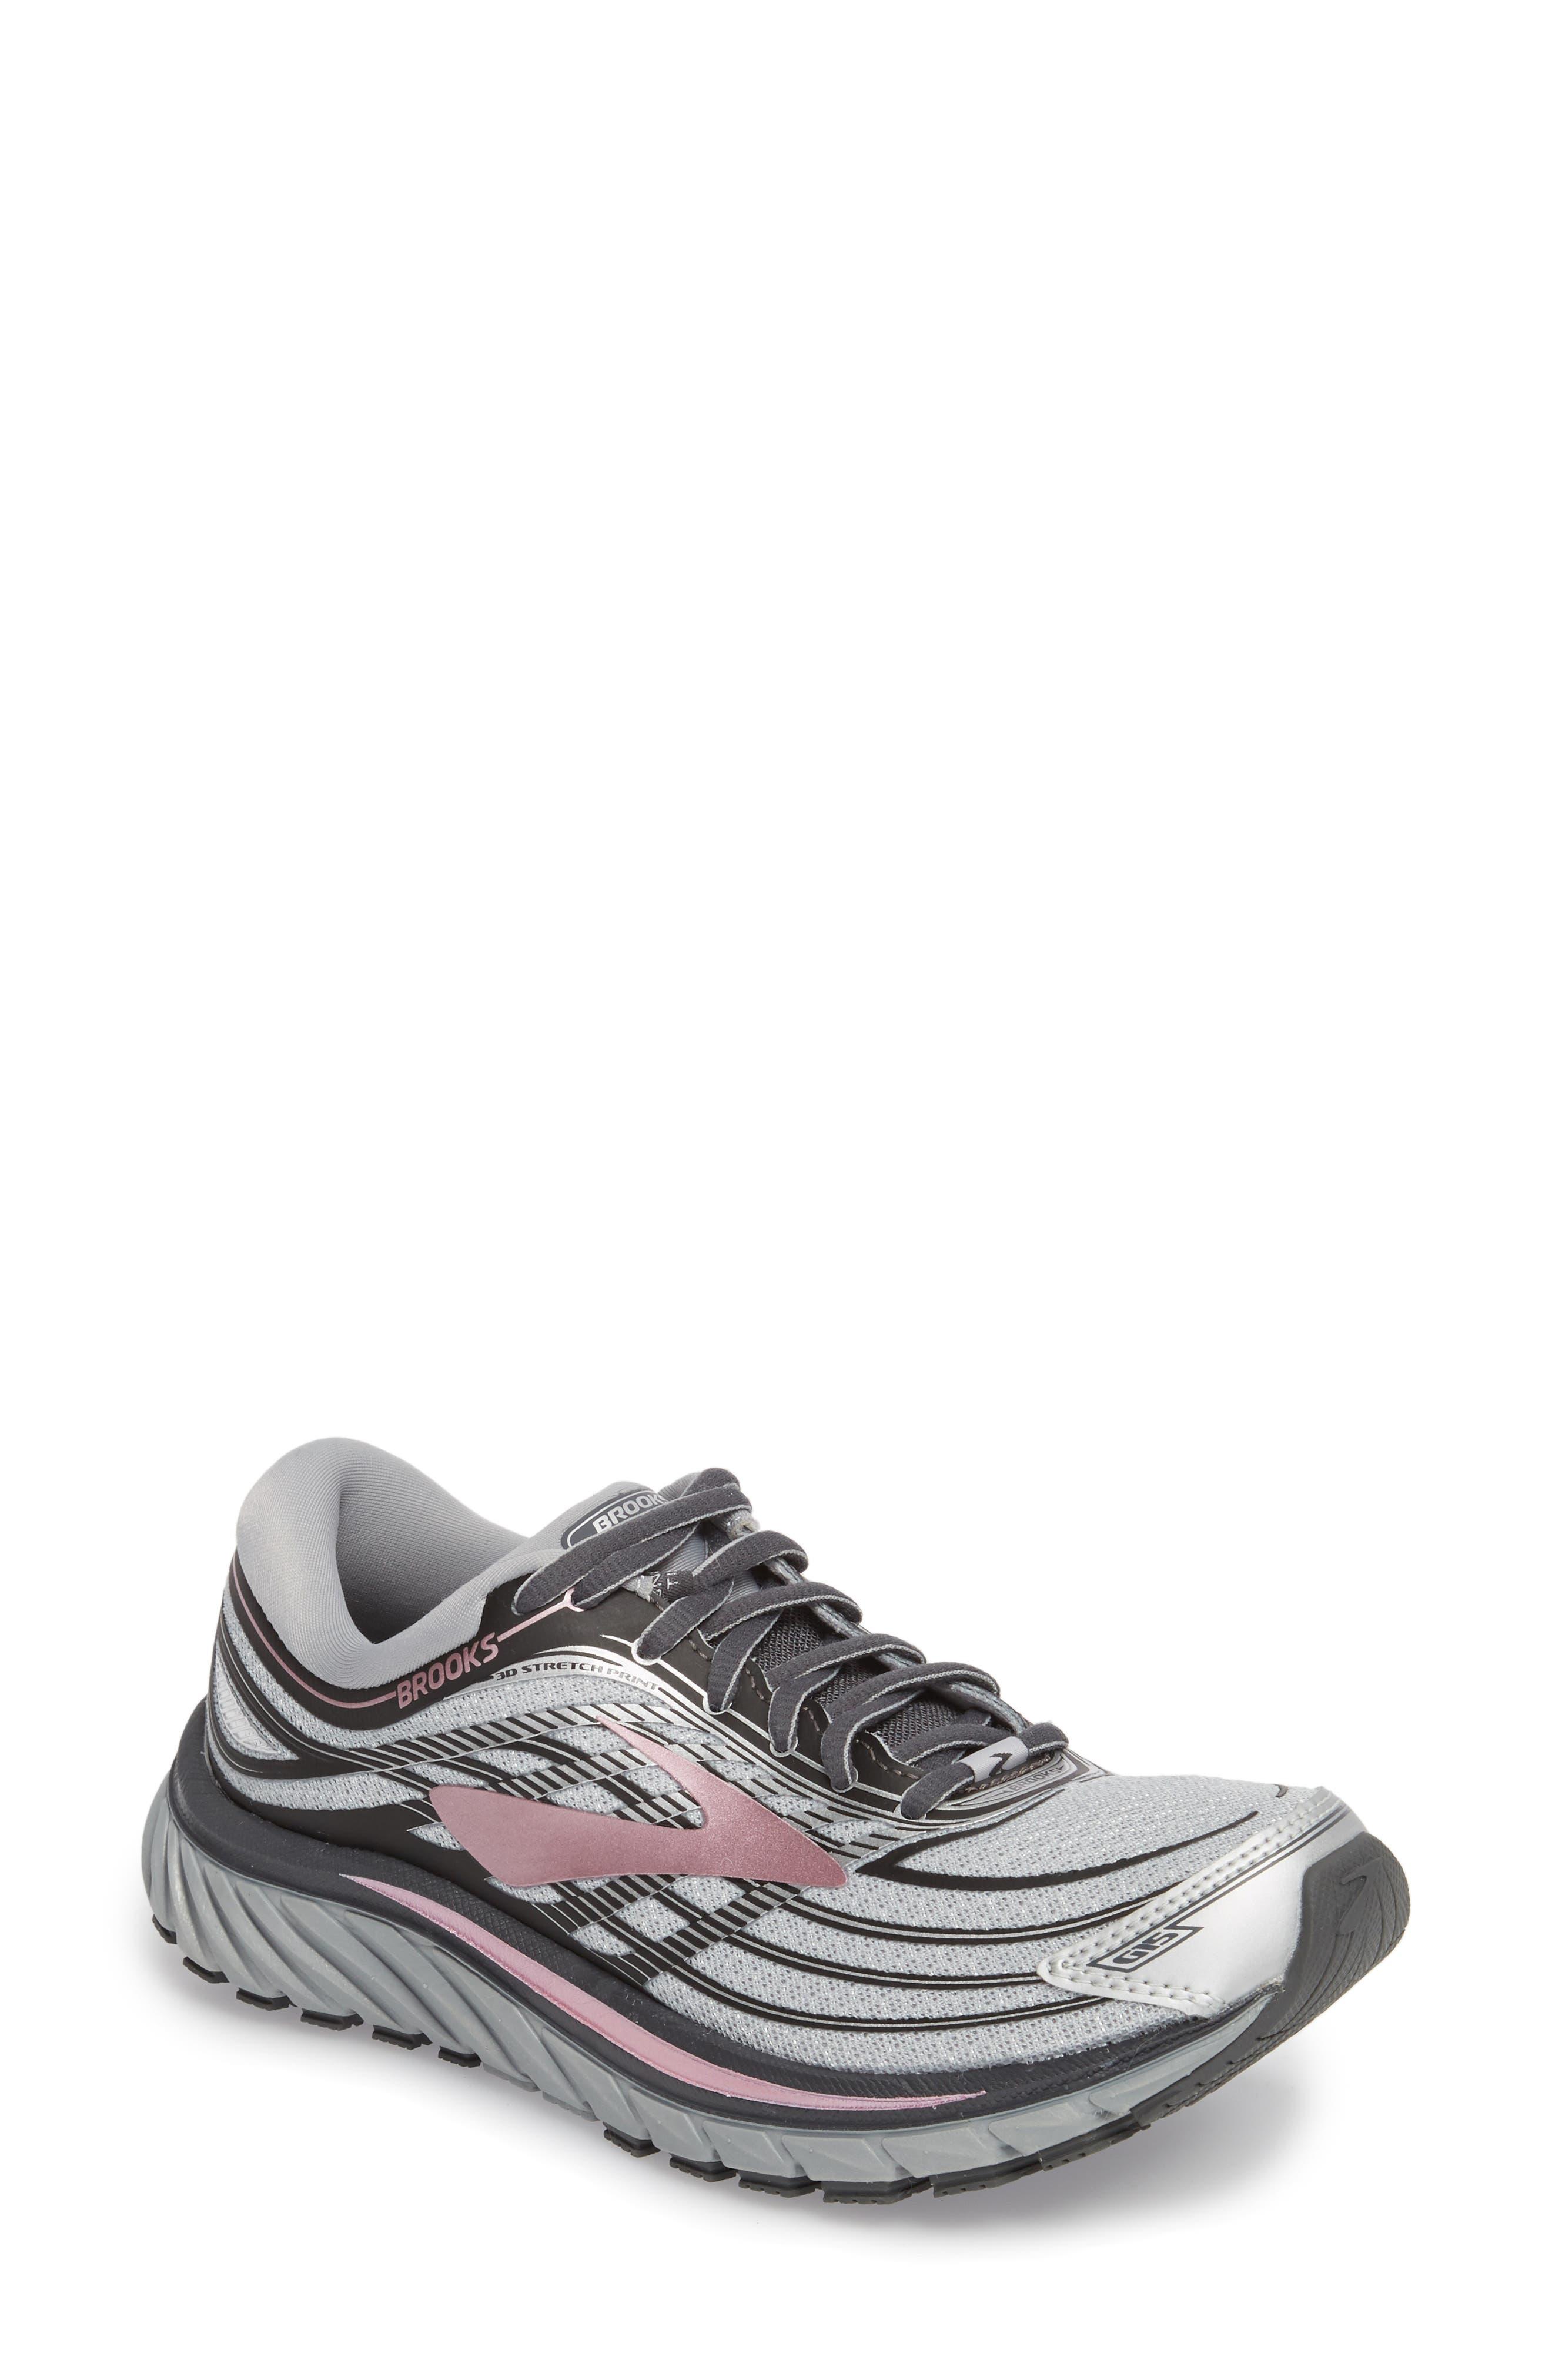 Glycerin 15 Running Shoe,                             Main thumbnail 1, color,                             Silver/ Grey/ Rose